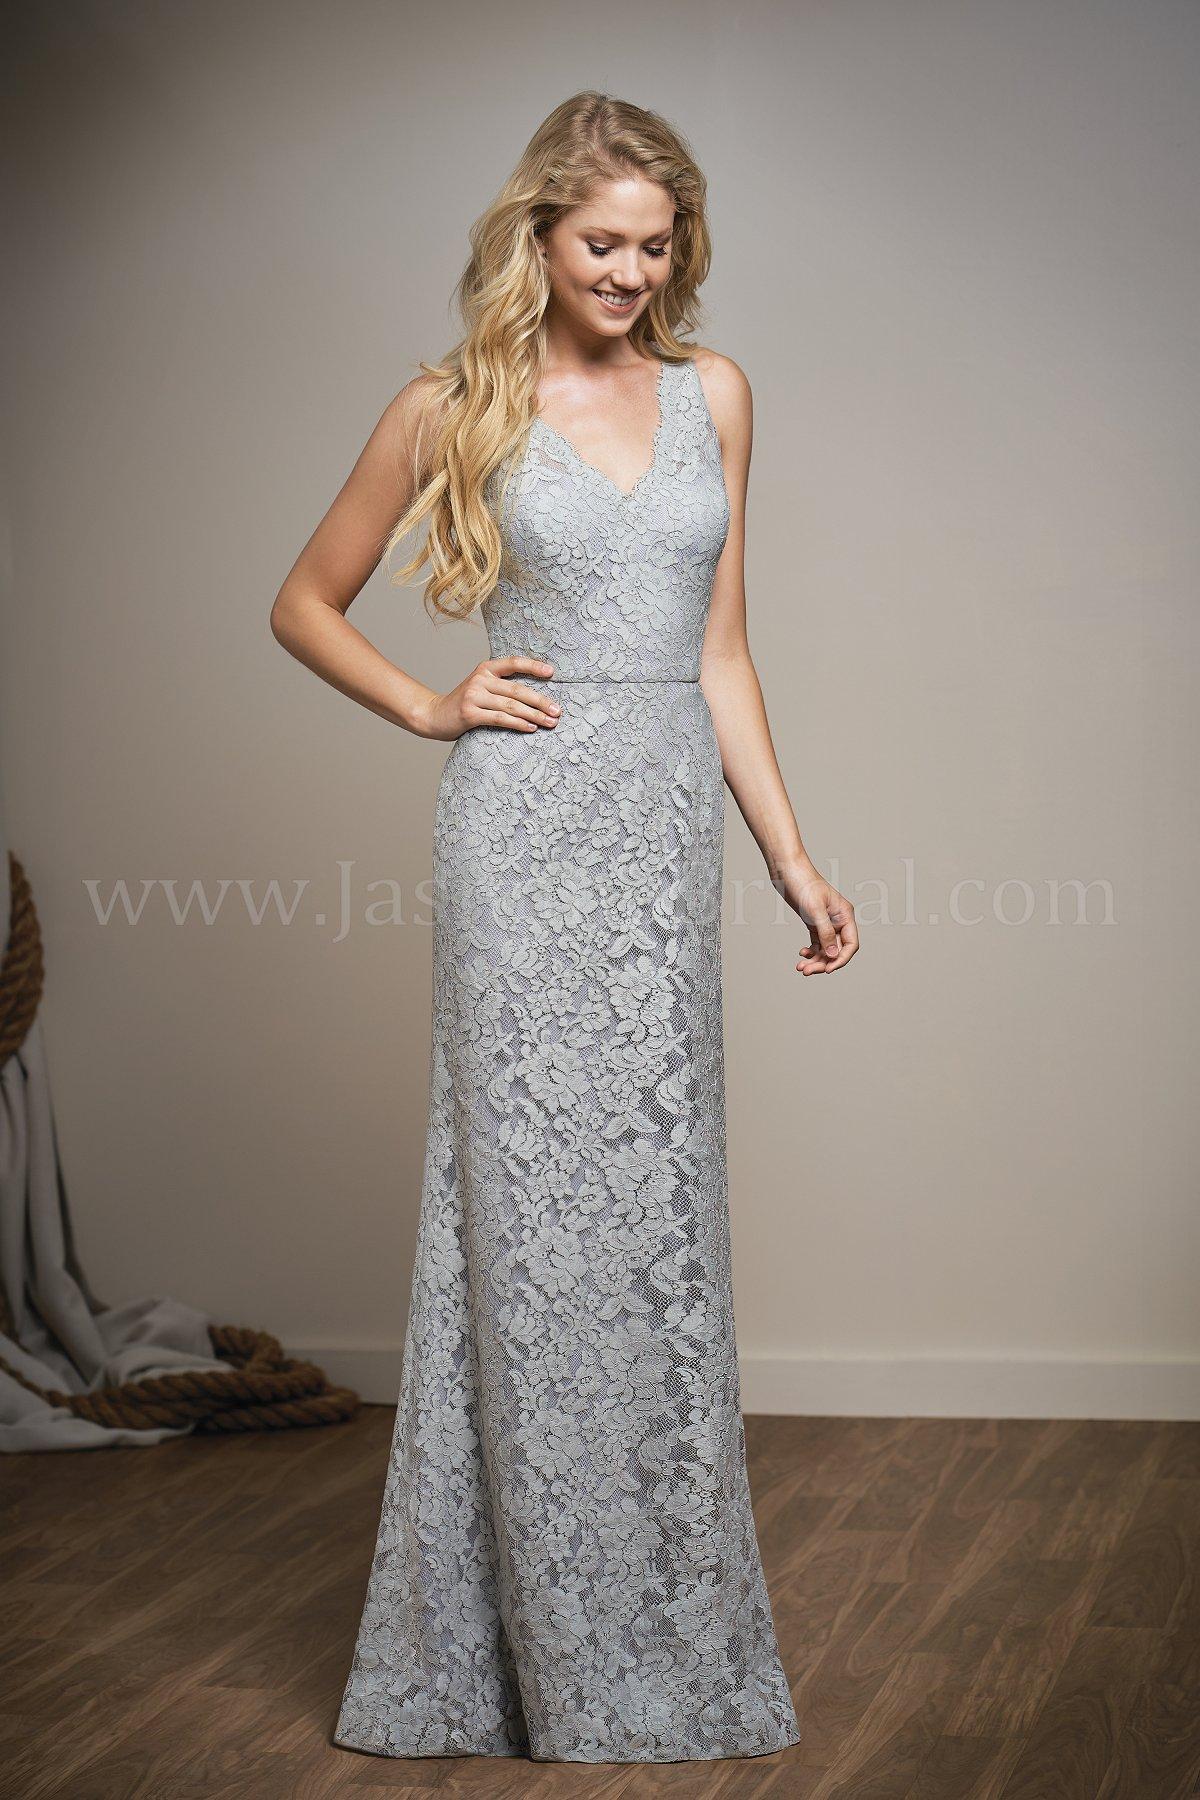 Bridesmaid Lace Dresses